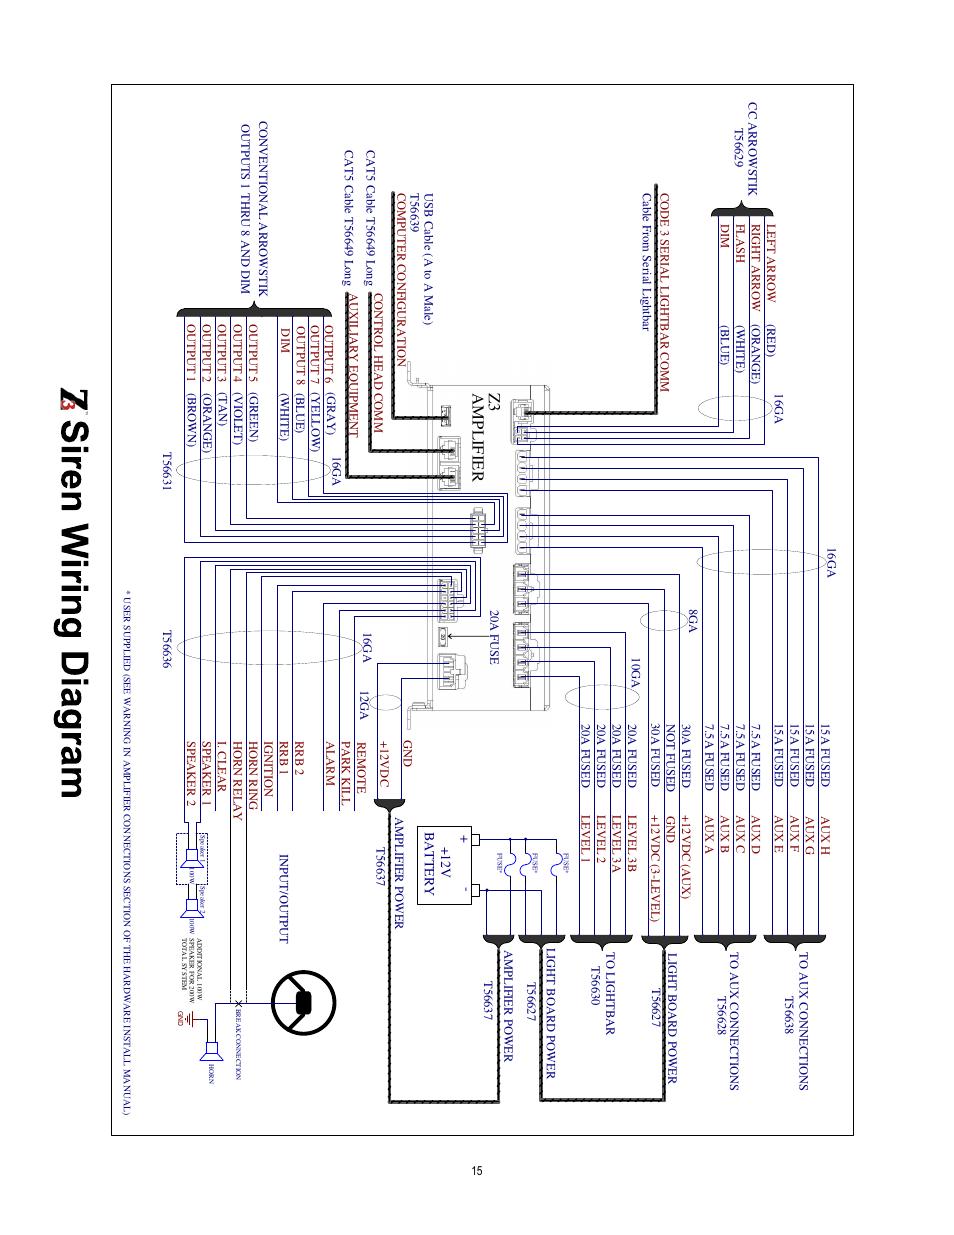 medium resolution of code 3 siren wiring diagram manual e book code 3 siren box model 3892l6 wiring diagram